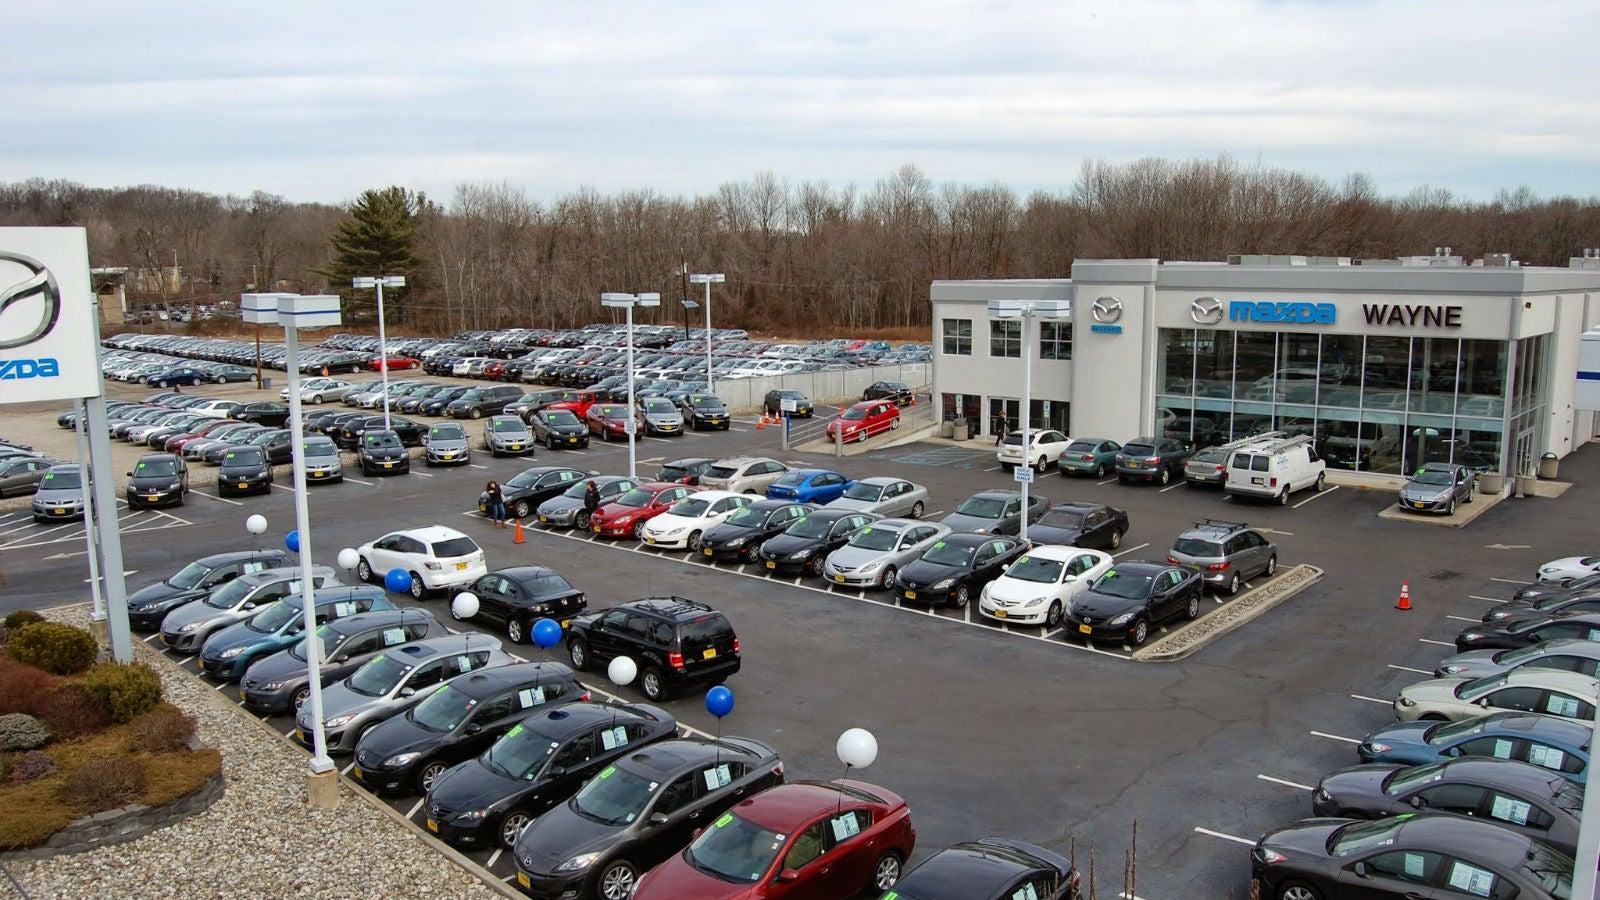 Investigation Says New Jersey Dealership Sold Rental Cars ...